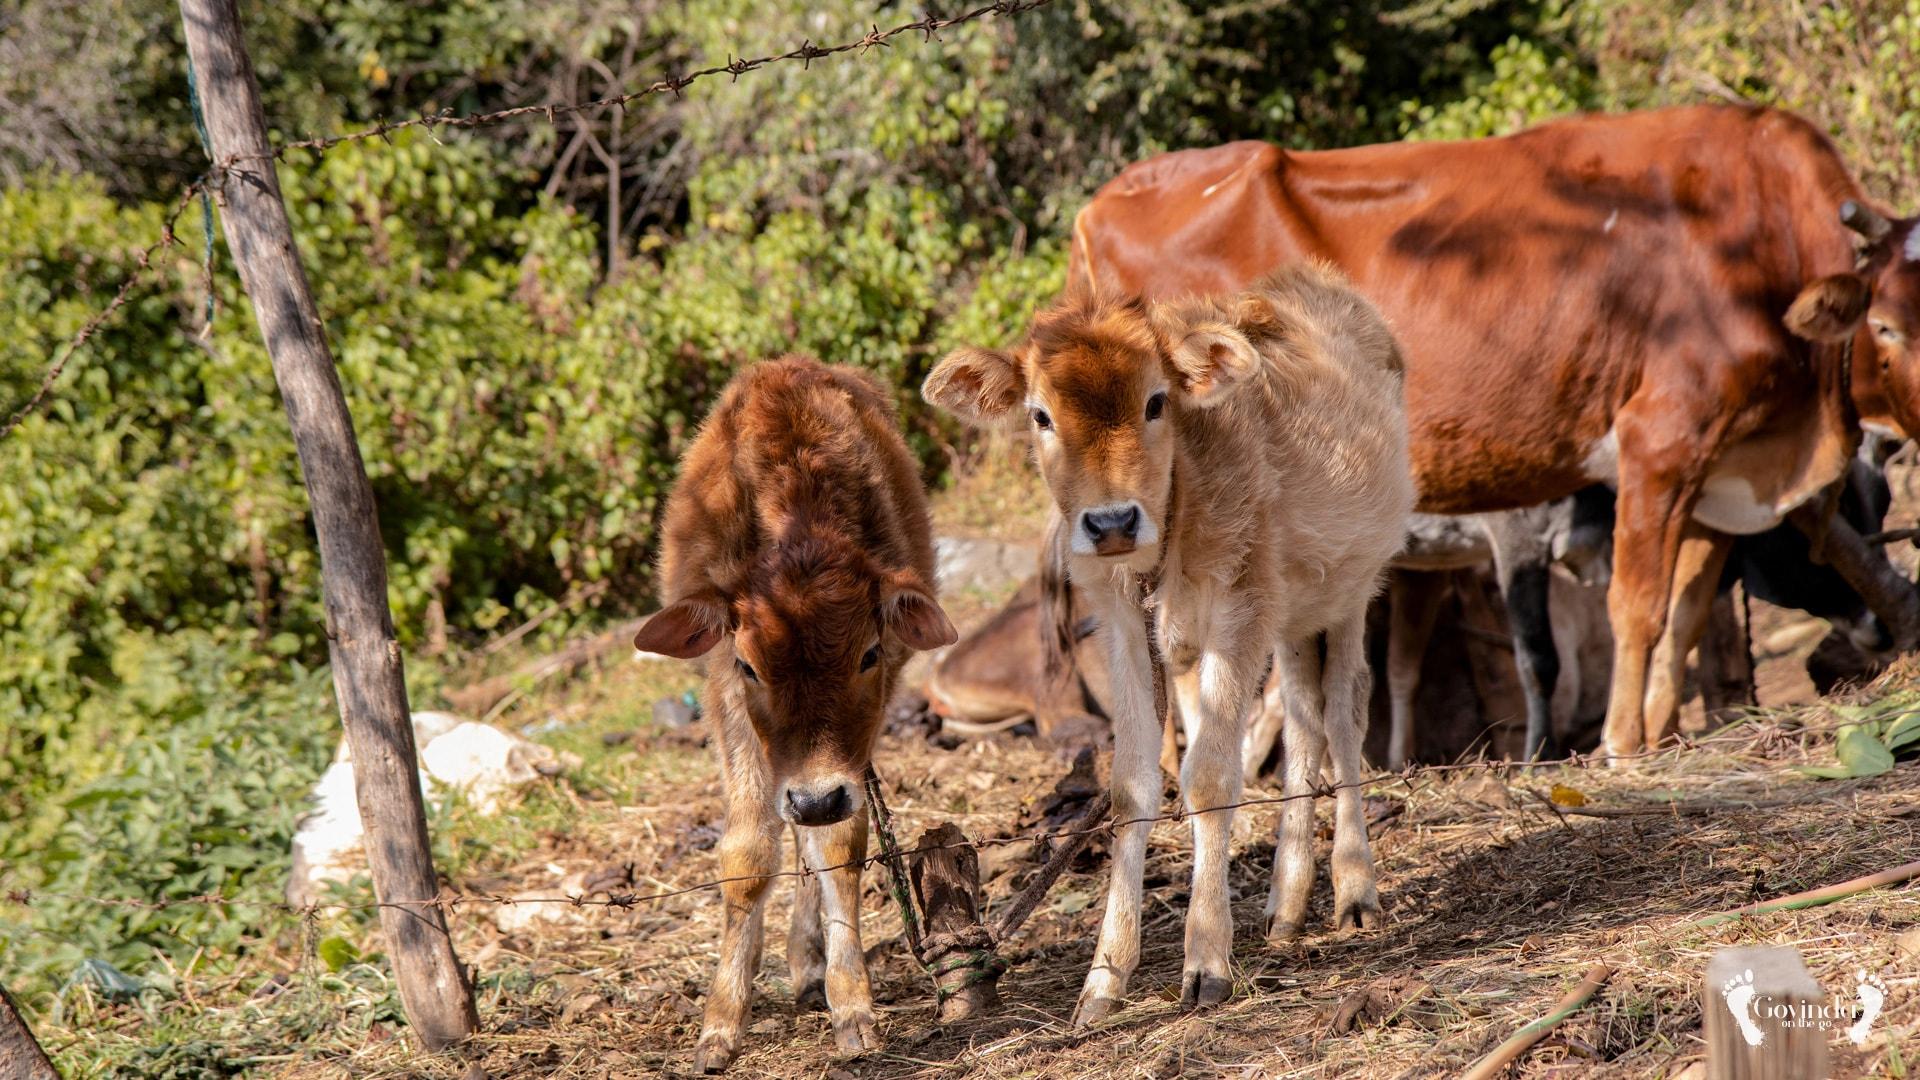 Cows on the way to Mahavatar Babaji's cave